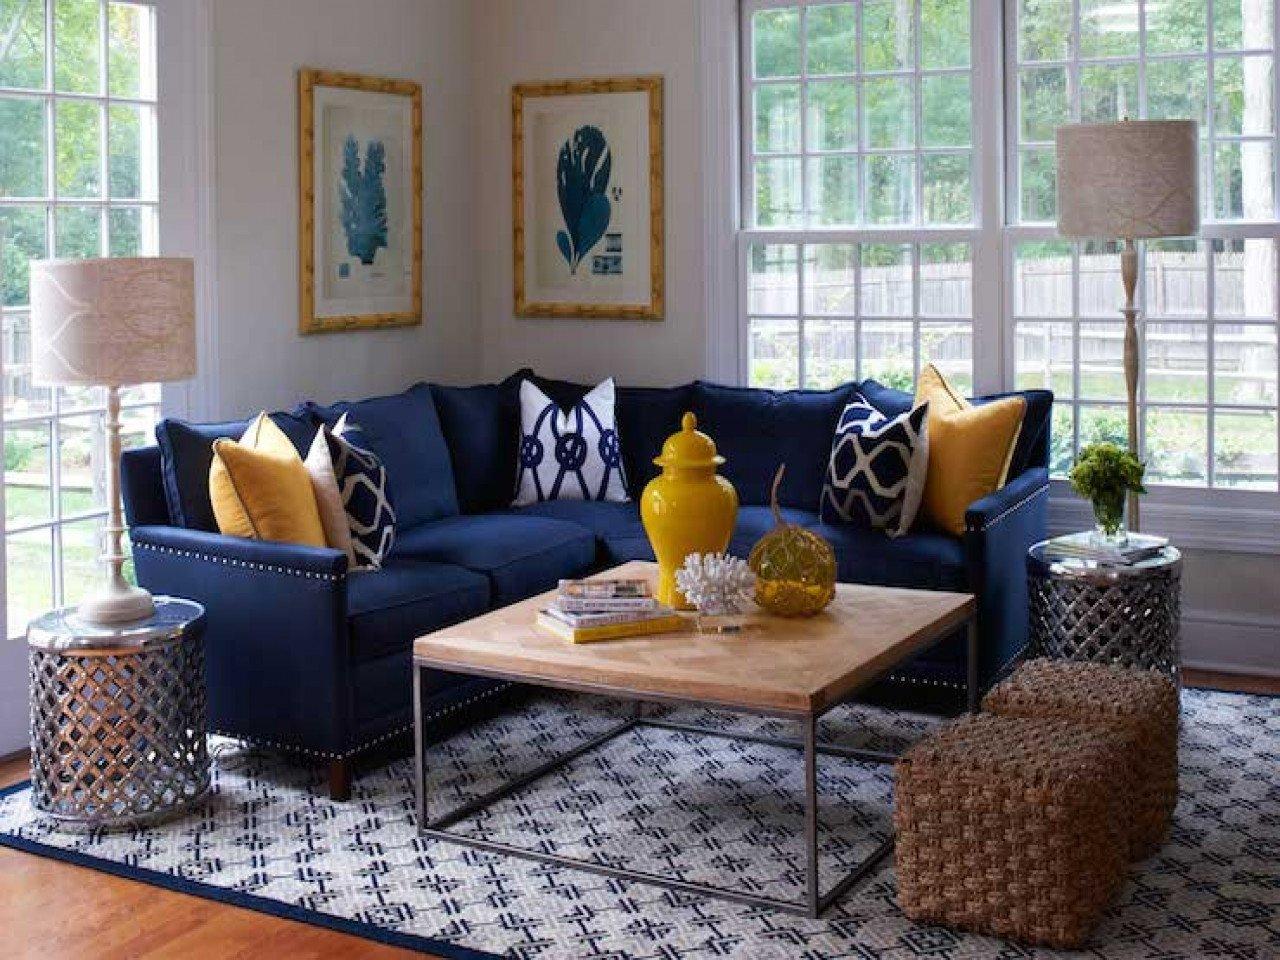 Blue Living Room Decor Ideas Beautiful Navy Blue Sectional sofa Navy Blue sofa Decorating Ideas